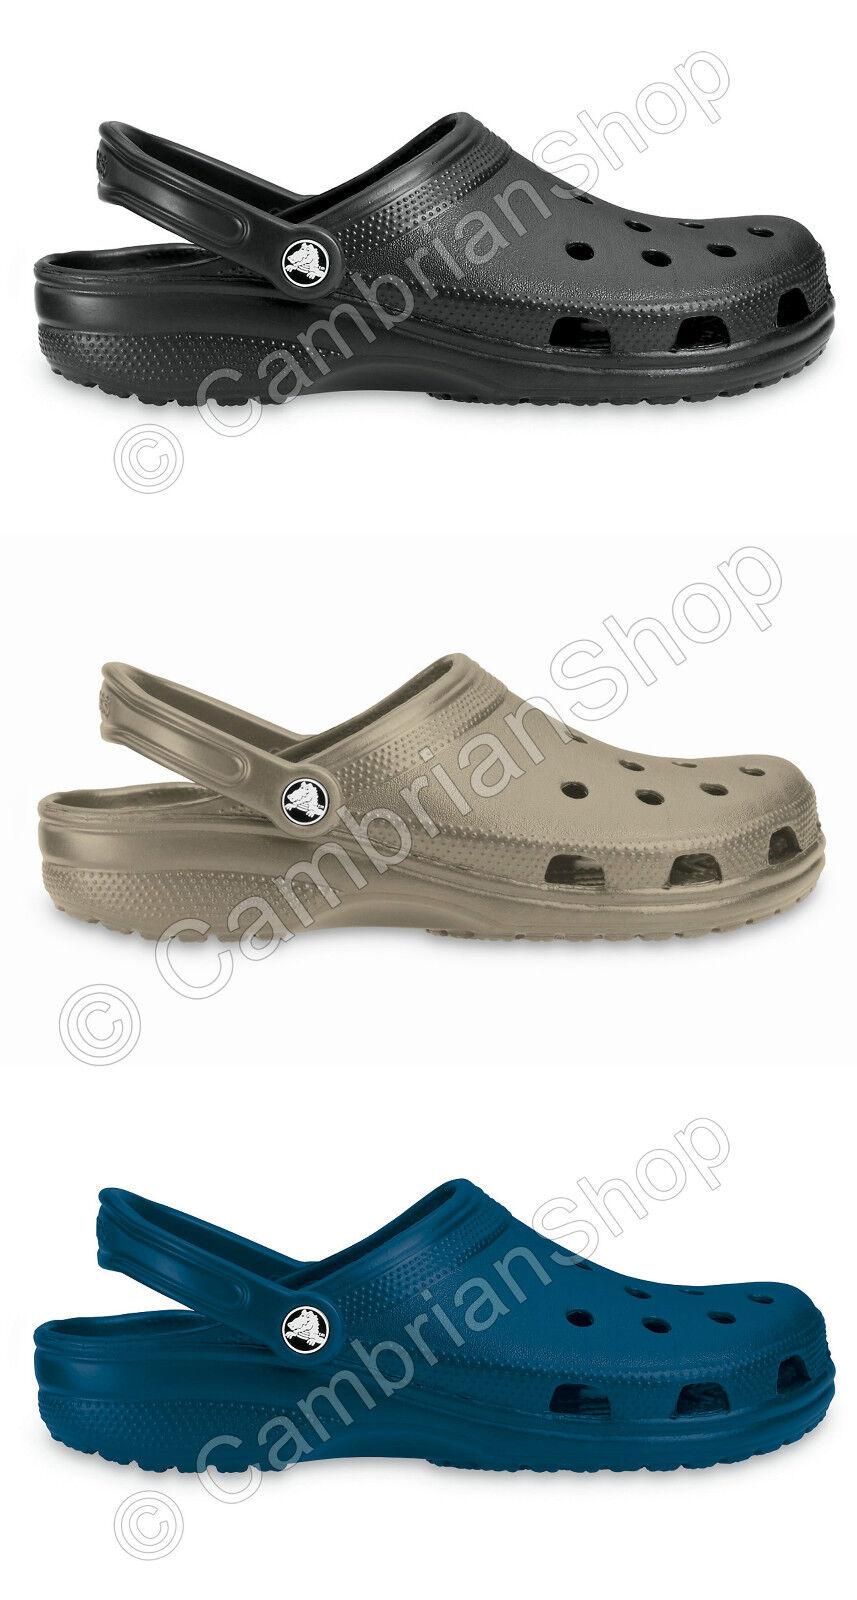 Genuine Crocs Classic Cayman Clog Adult Men Women Shoe Black Khaki Navy Blue